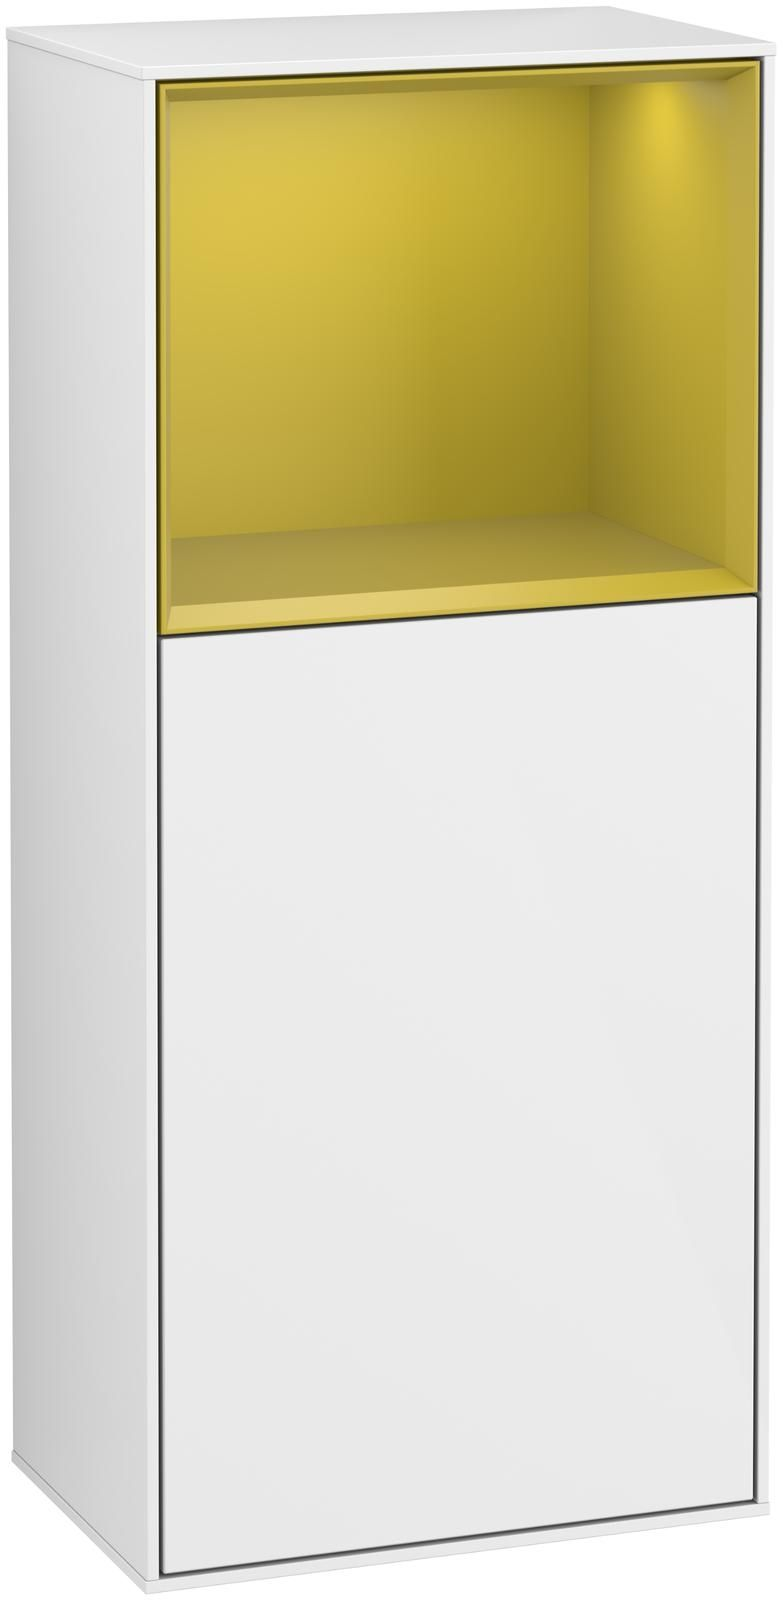 Villeroy & Boch Finion F50 Seitenschrank mit Regalelement 1 Tür Anschlag links LED-Beleuchtung B:41,8xH:93,6xT:27cm Front, Korpus: Glossy White Lack, Regal: Sun F500HEGF